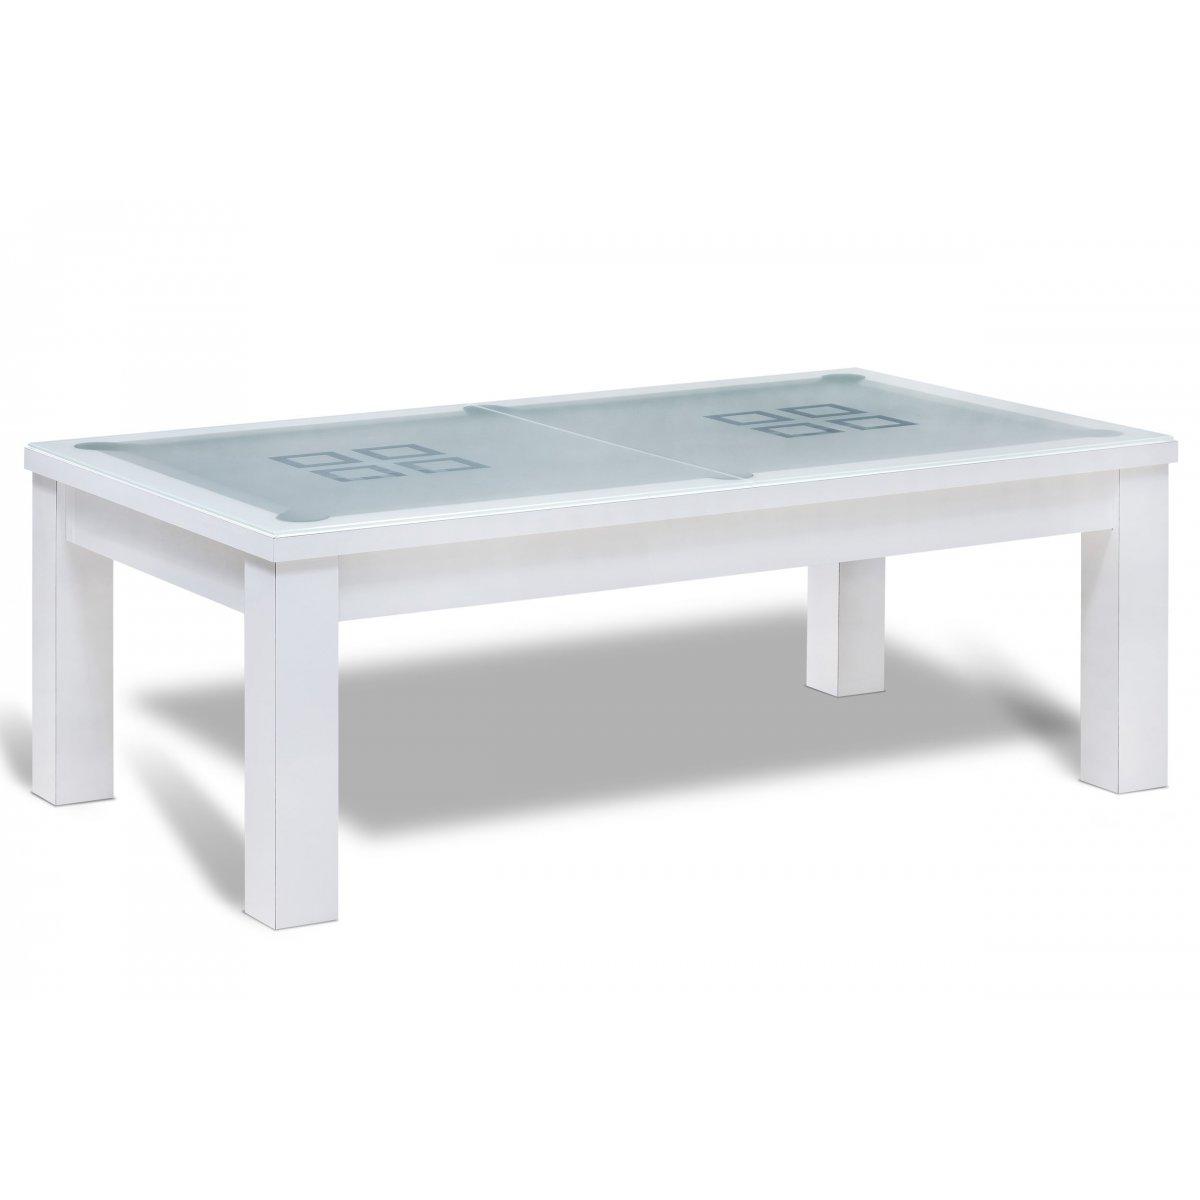 table de billard convertible pas cher. Black Bedroom Furniture Sets. Home Design Ideas